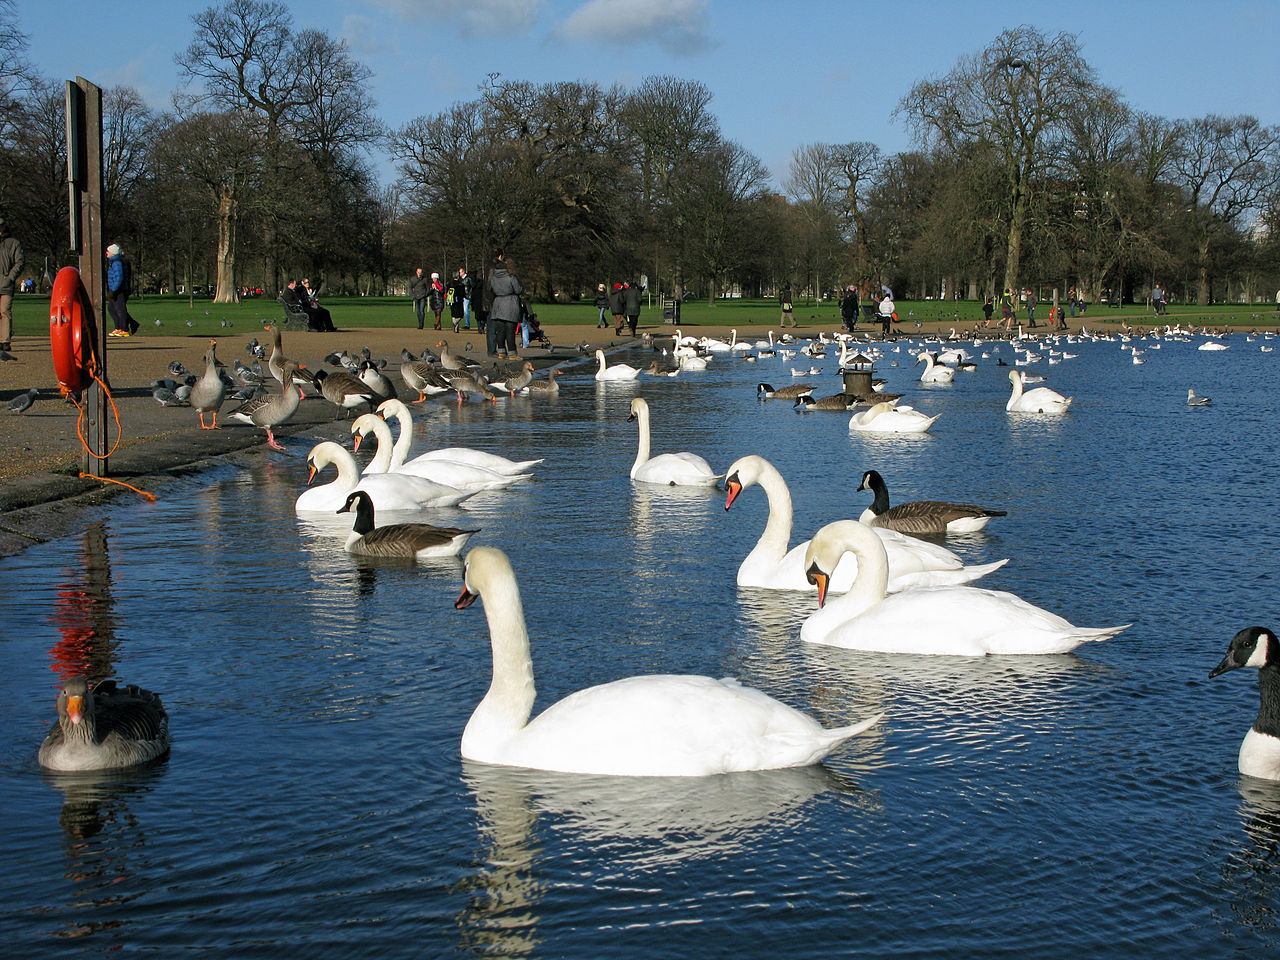 File:Round Pond Kensington Gardens.jpg - Wikimedia Commons